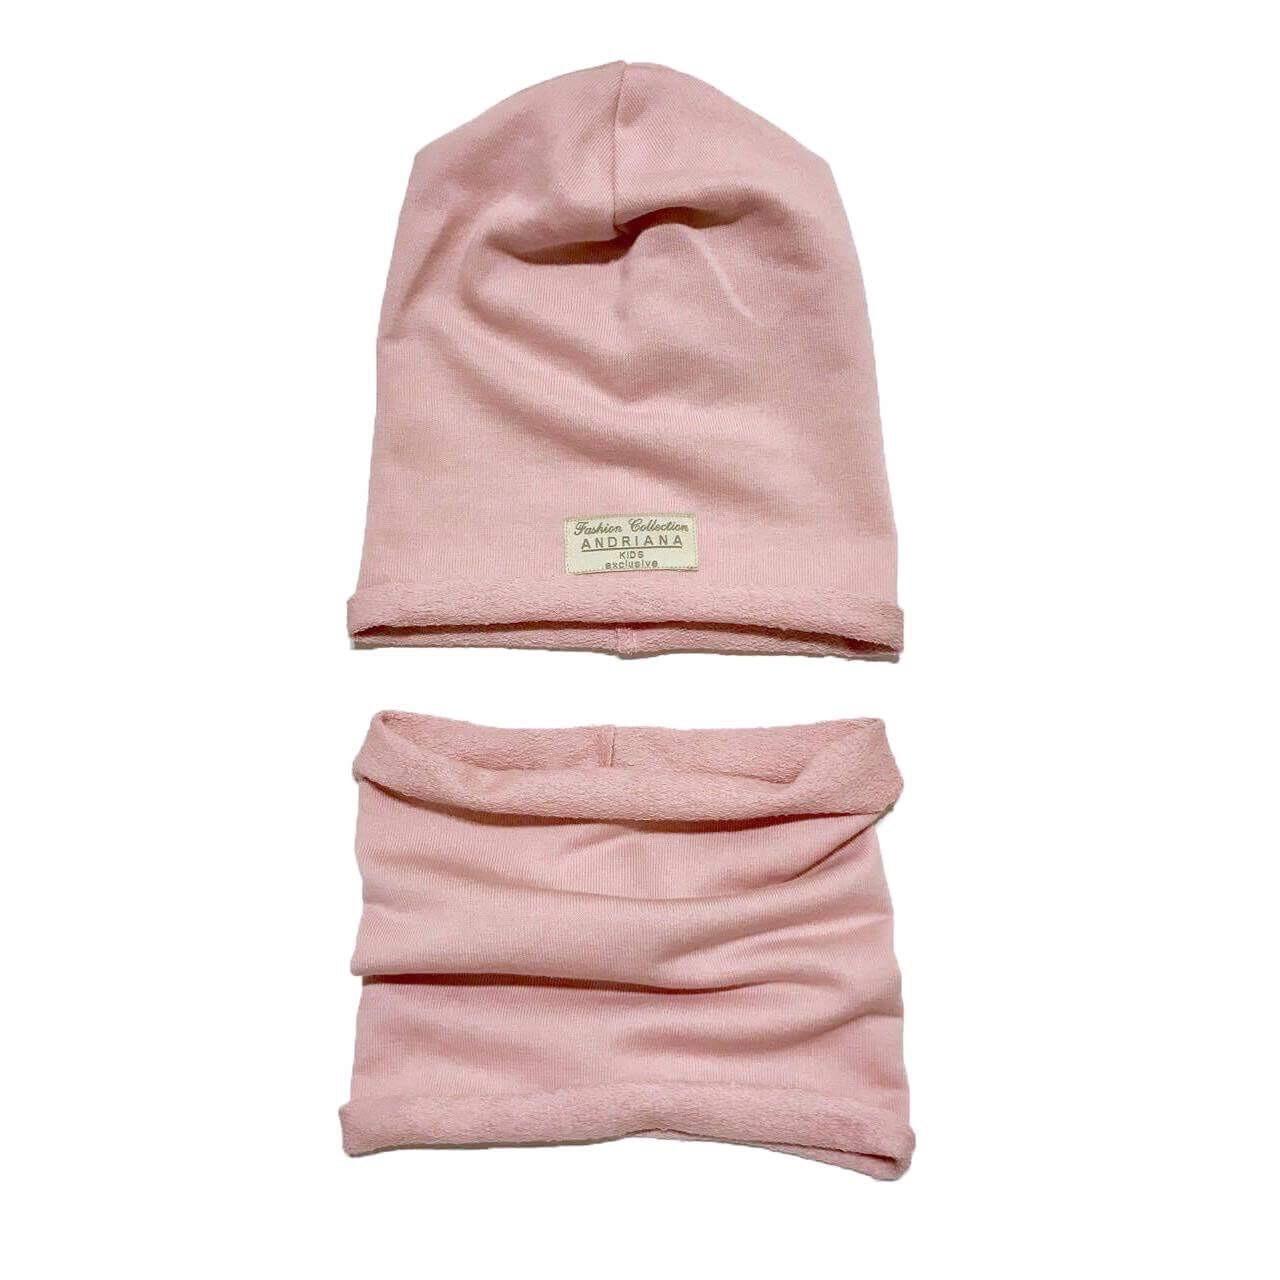 Набор шапочка + хомут 44-46,52-54 см. Andriana Kids (розовый) - Melman в Львове